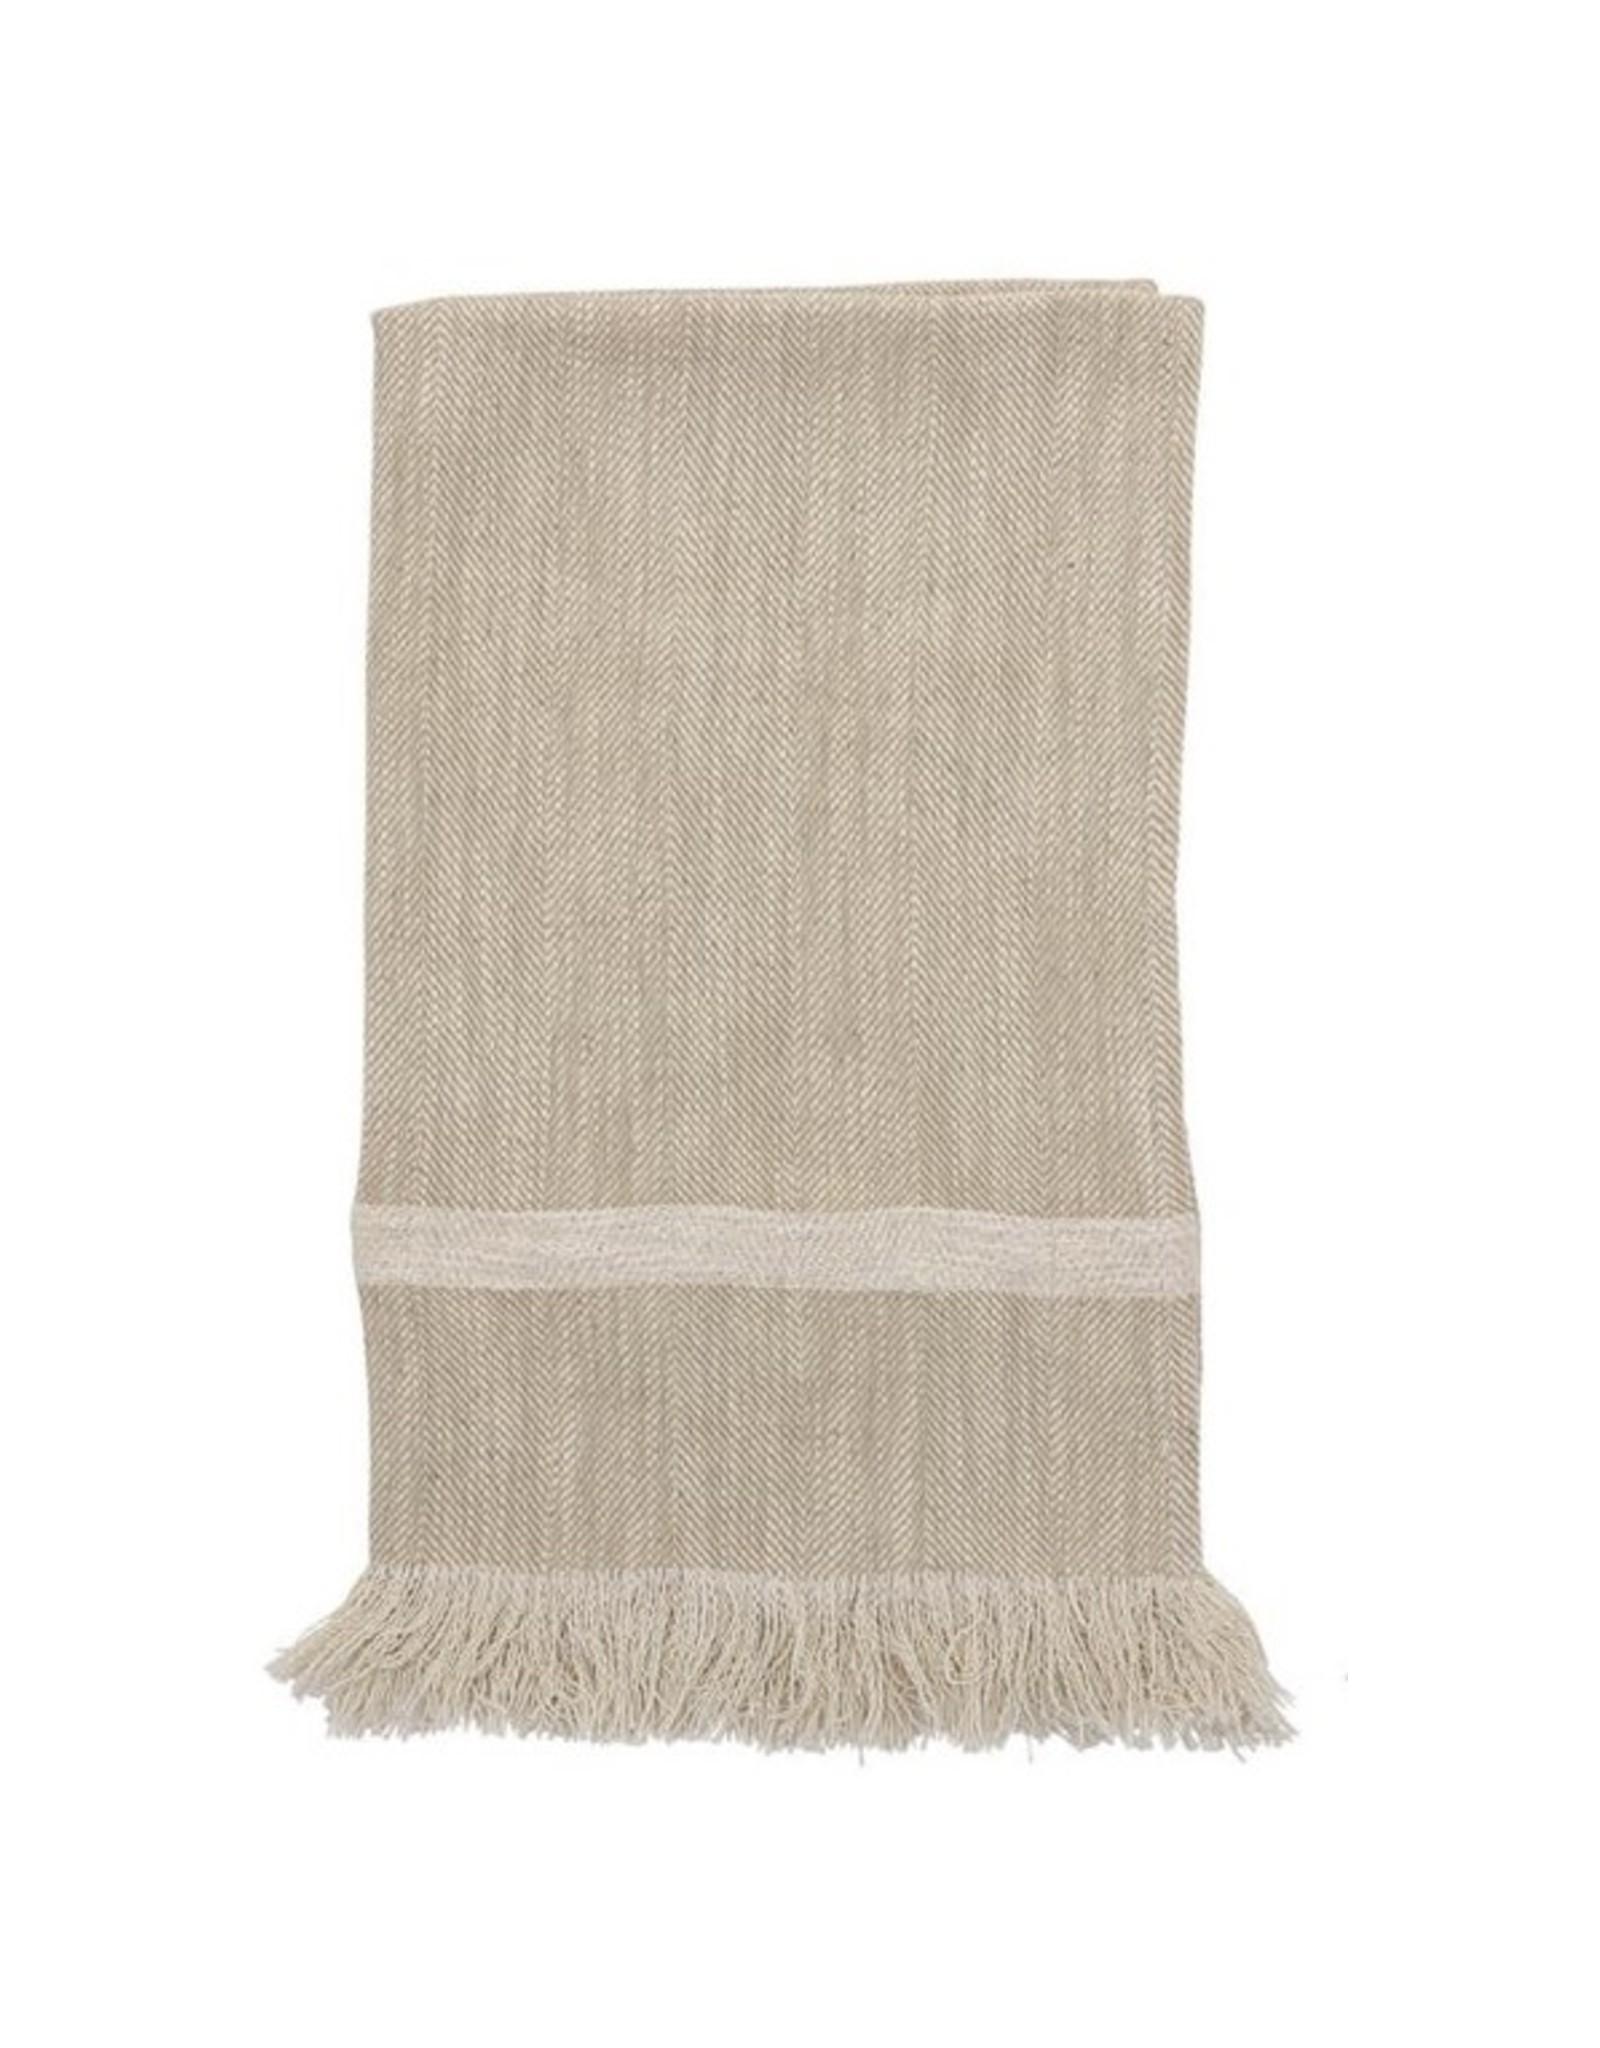 "Bloomingville 28"" L Cotton Striped Tea Towel w/ Fringe -Natural"